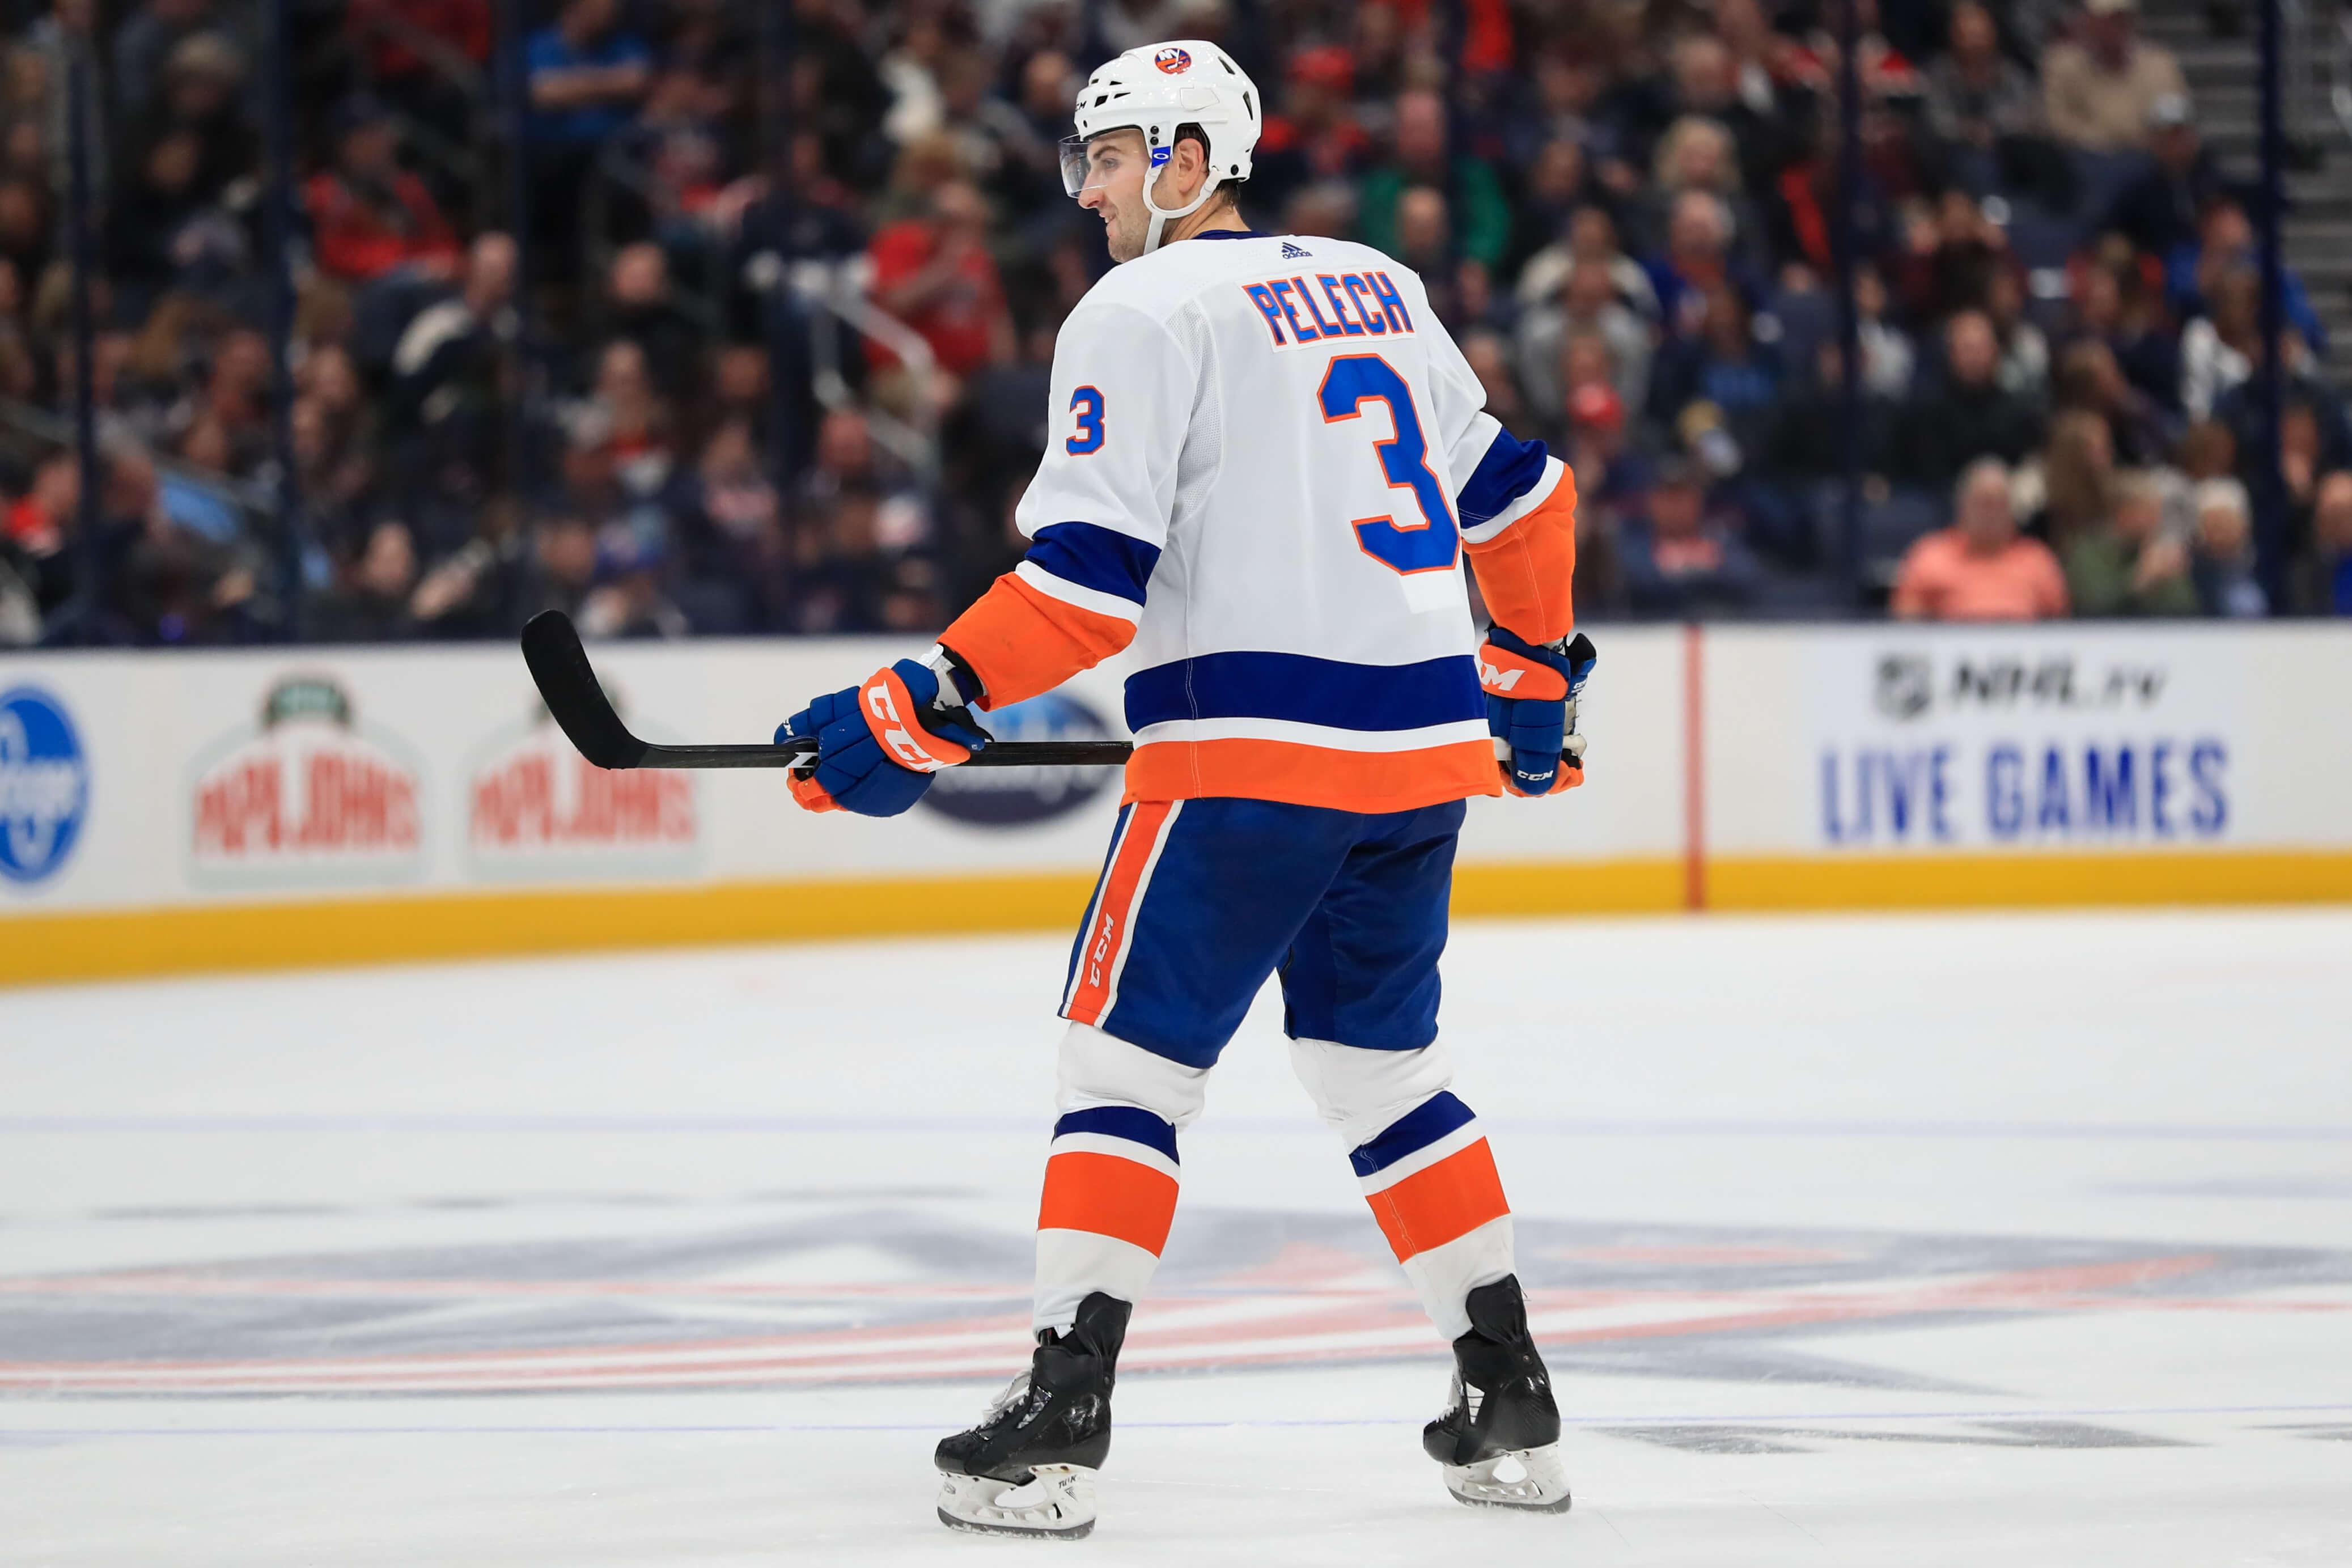 Adam Pelech, New York Islanders